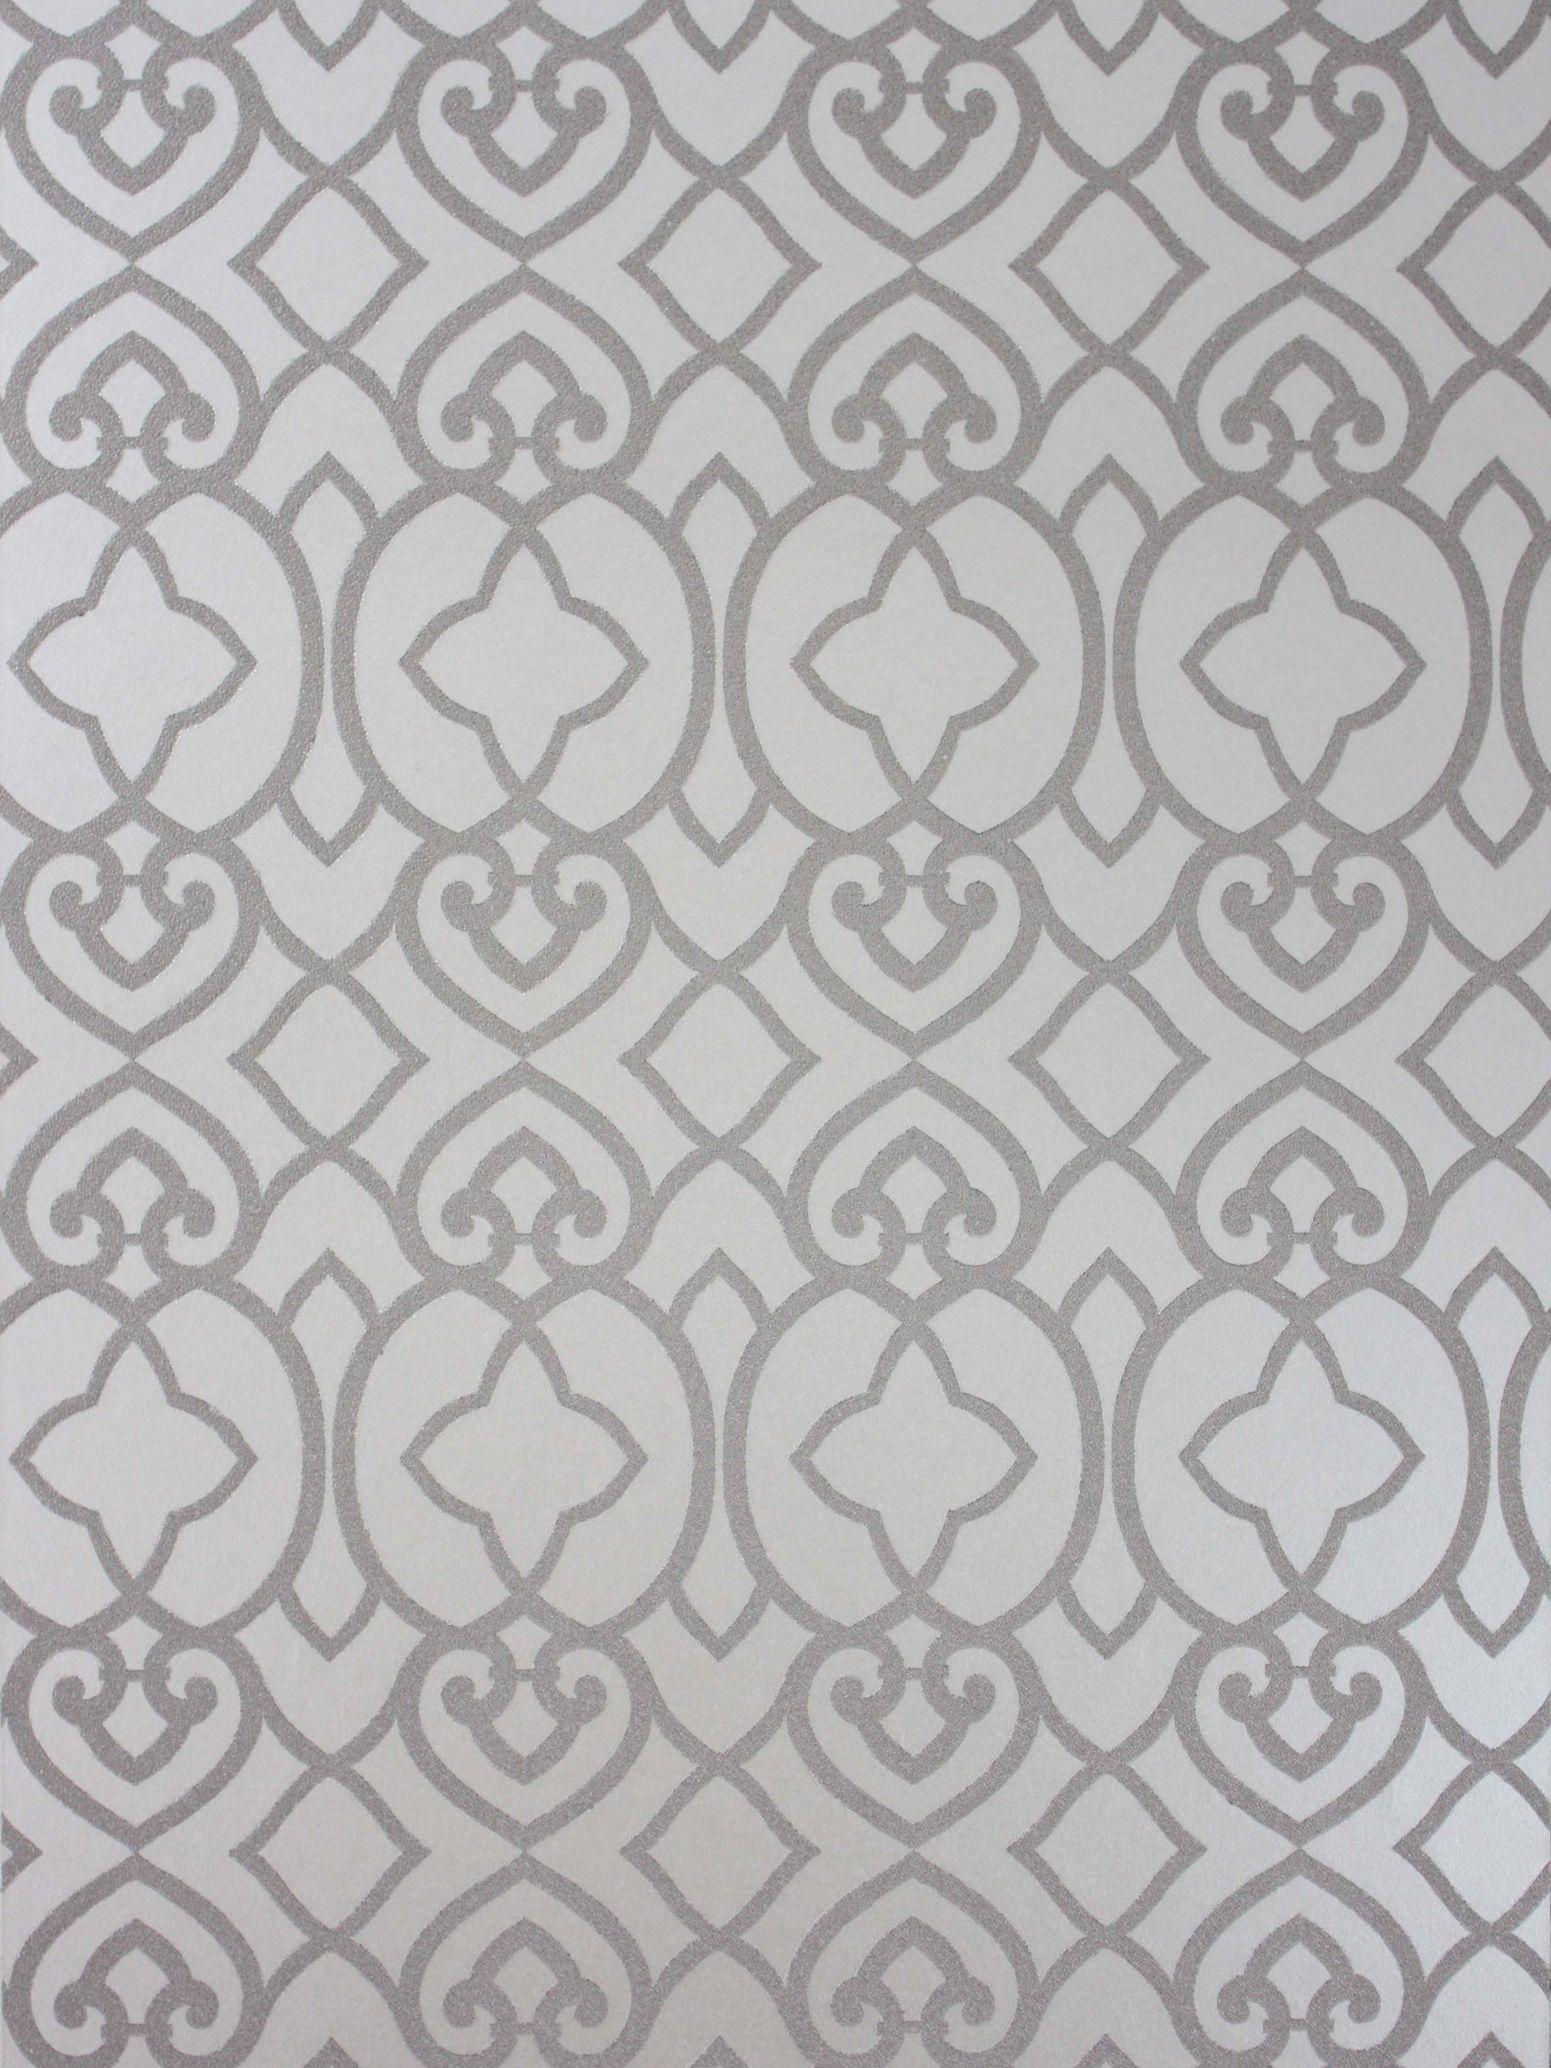 Matthew Williamson Matthew Williamson Imperial Lattice Wallpaper